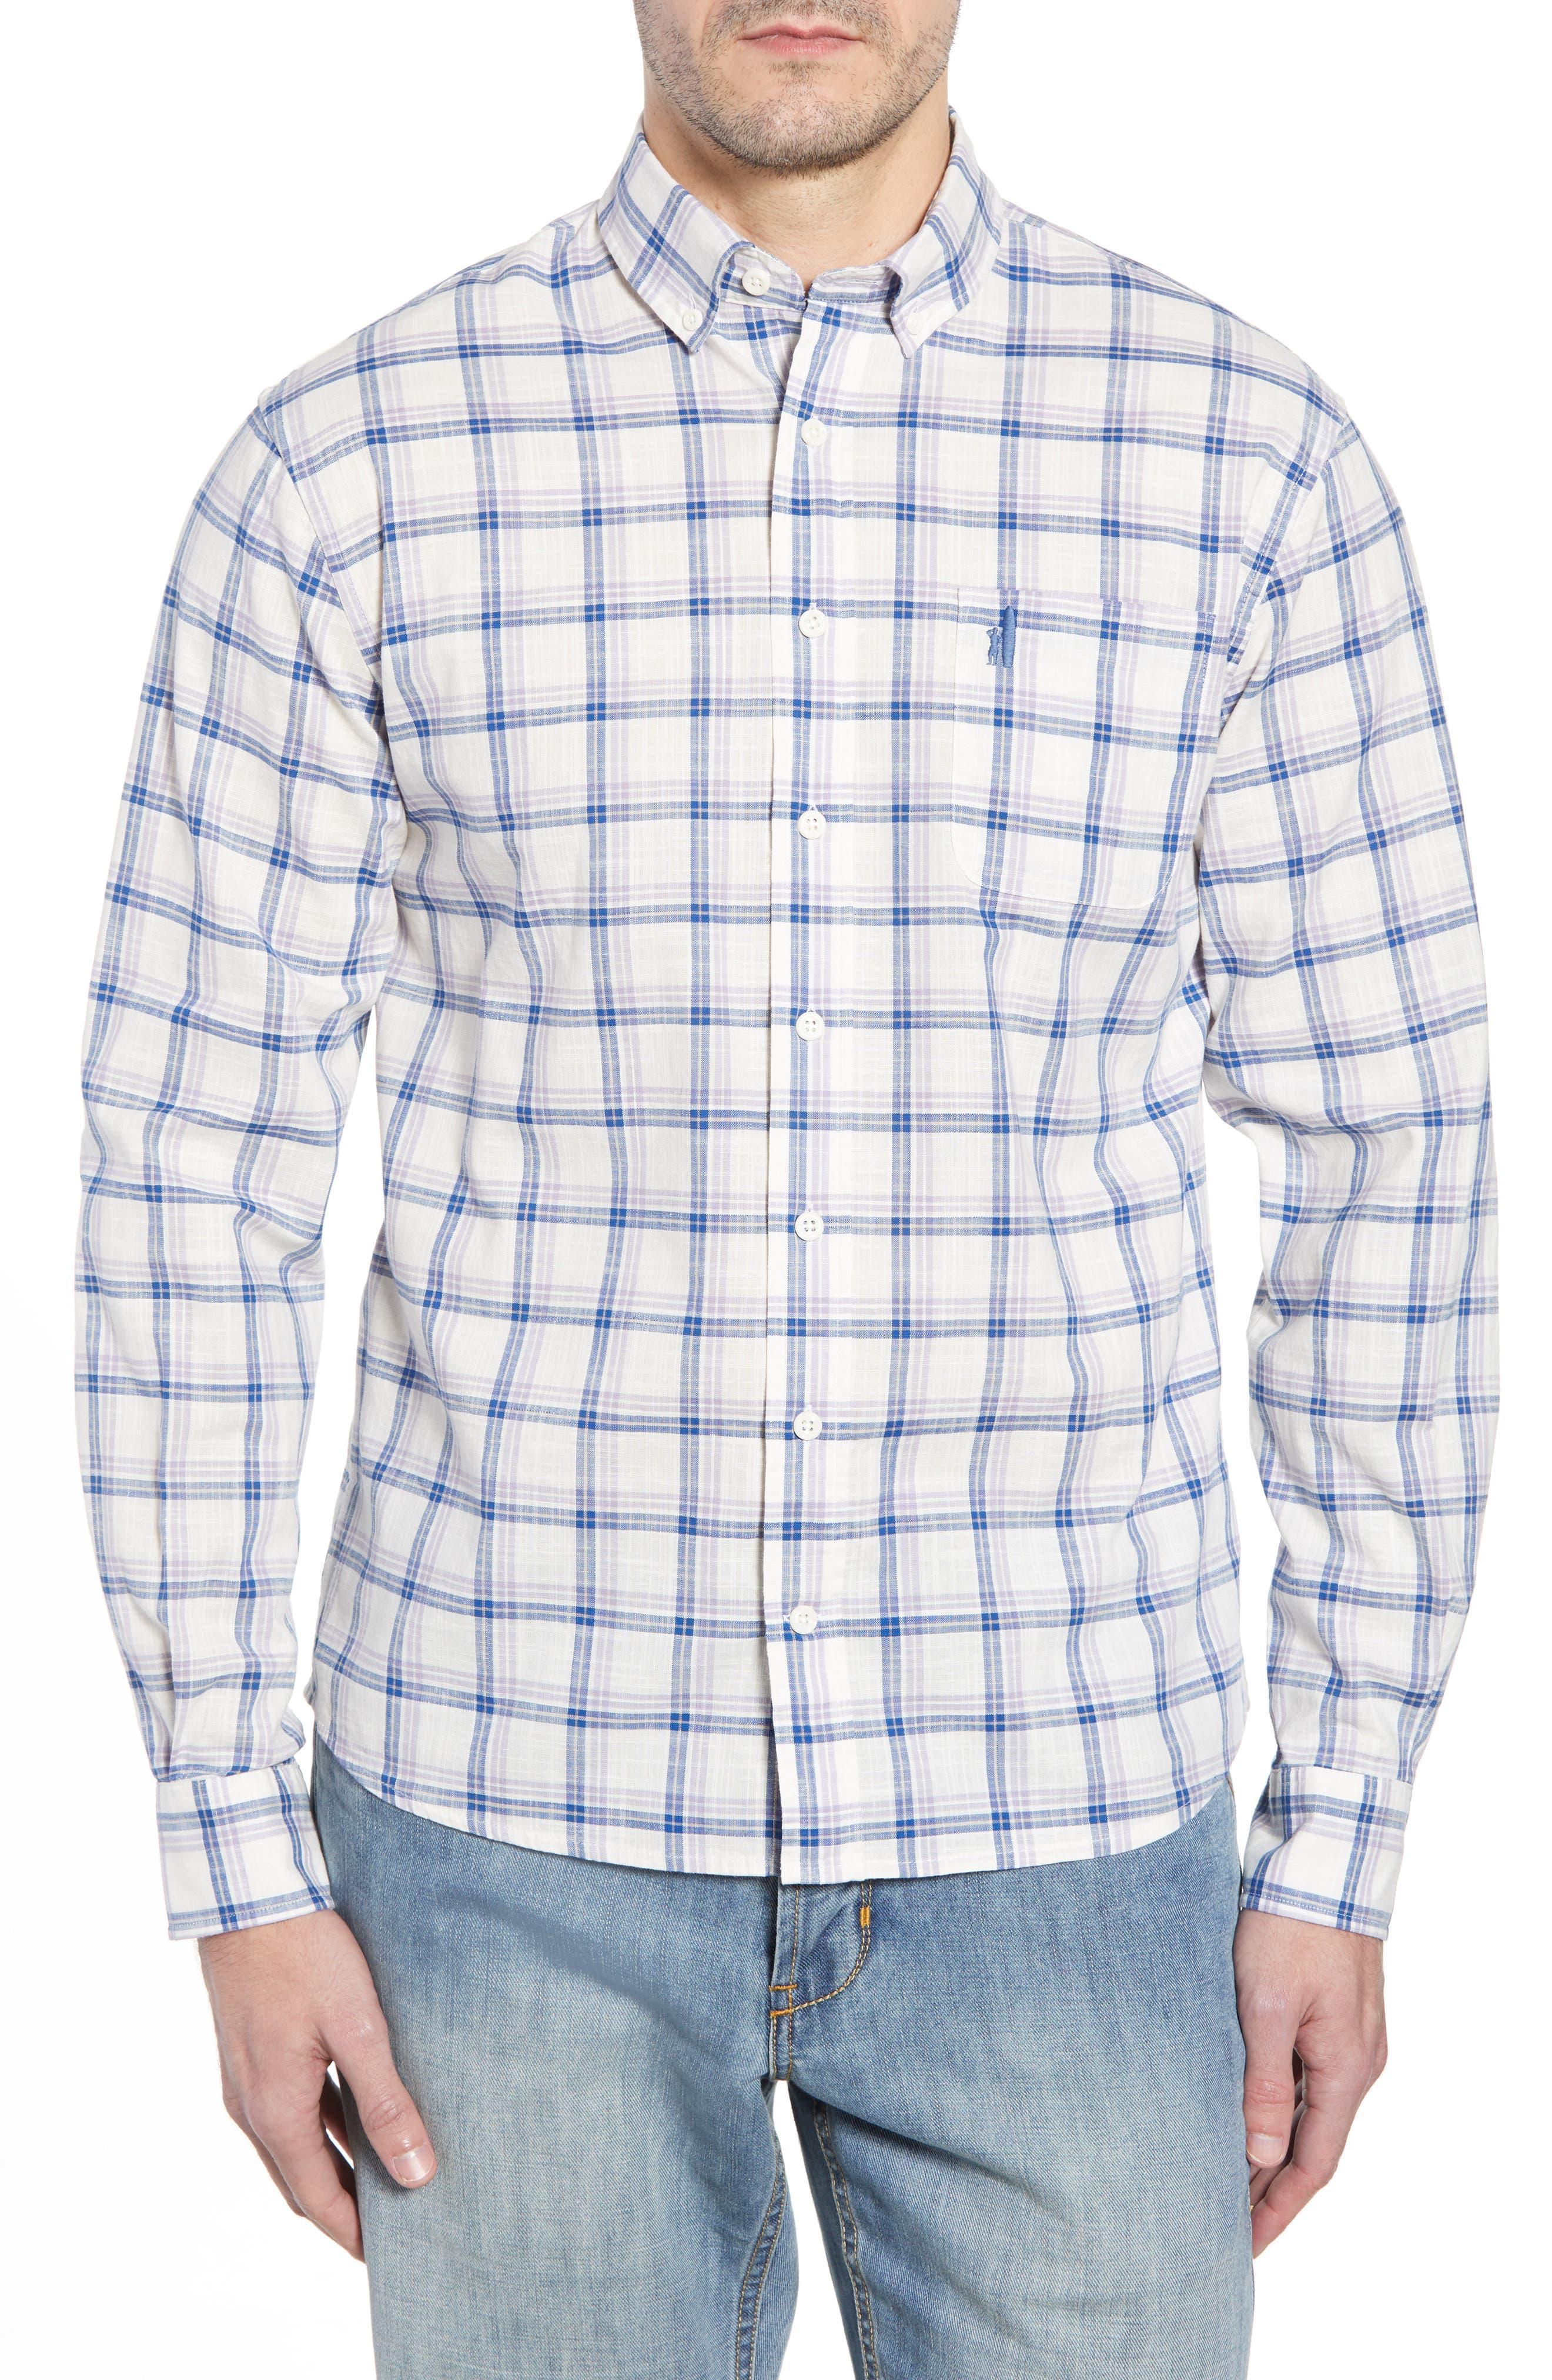 Davis Regular Fit Sport Shirt,                             Main thumbnail 1, color,                             Lilac